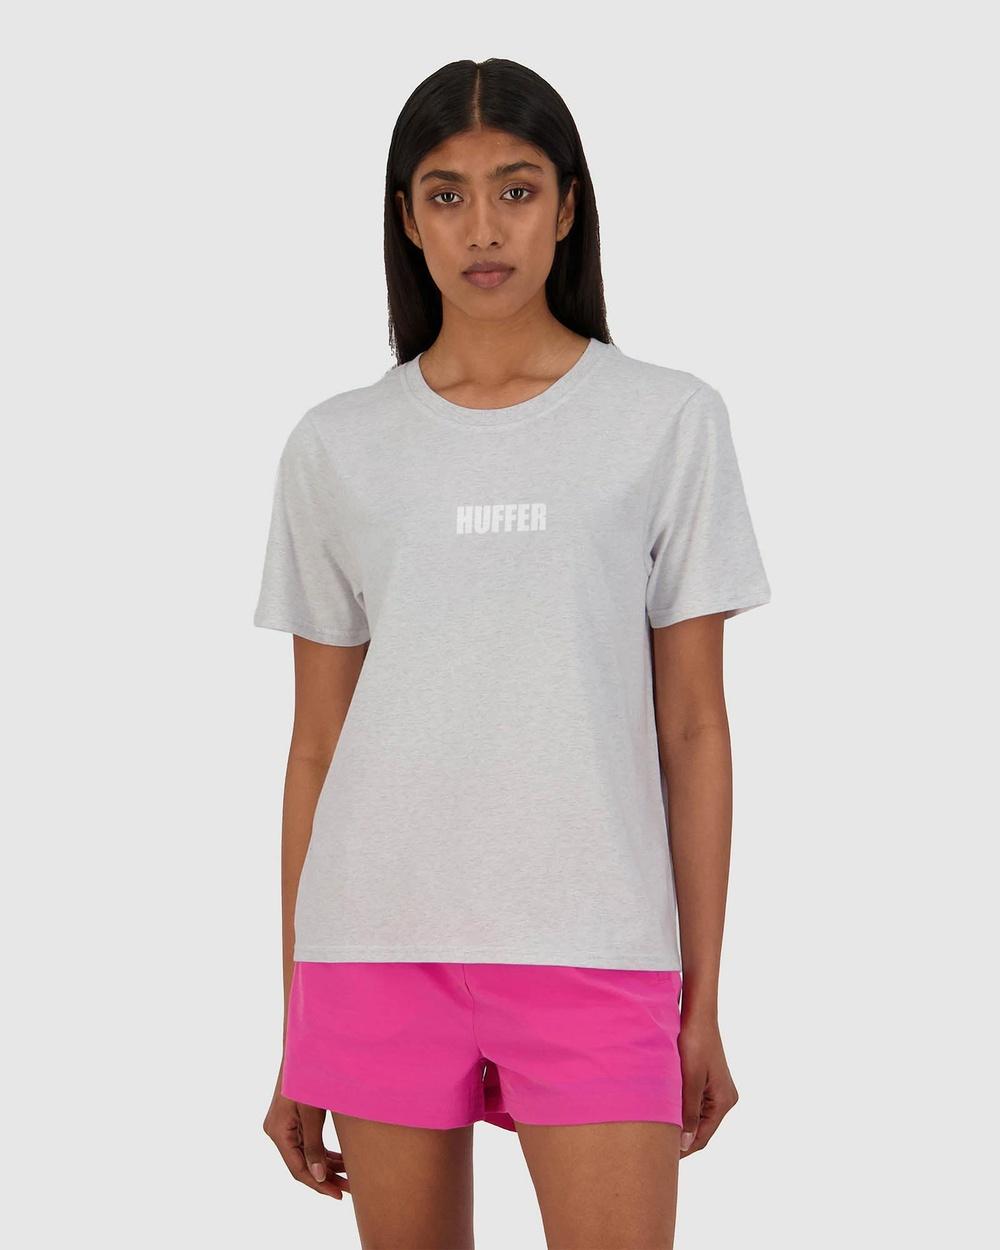 Huffer Women's Stella Tee Centric T-Shirts & Singlets Grey Tee-Centric Australia